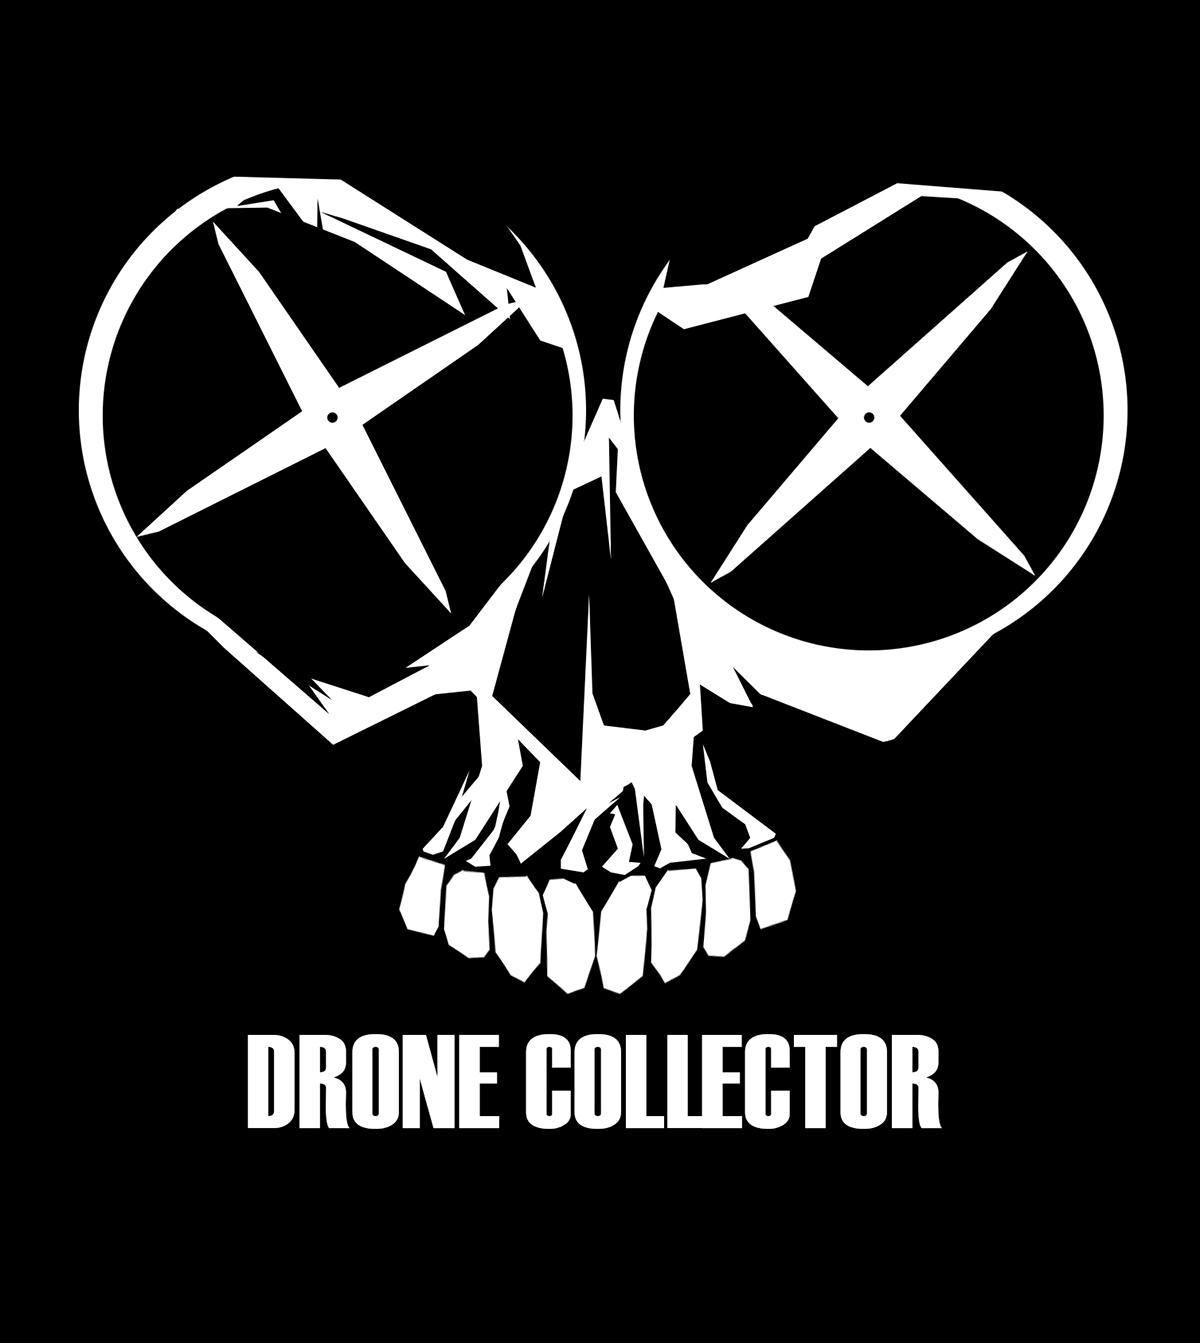 Drone Collector small.jpg